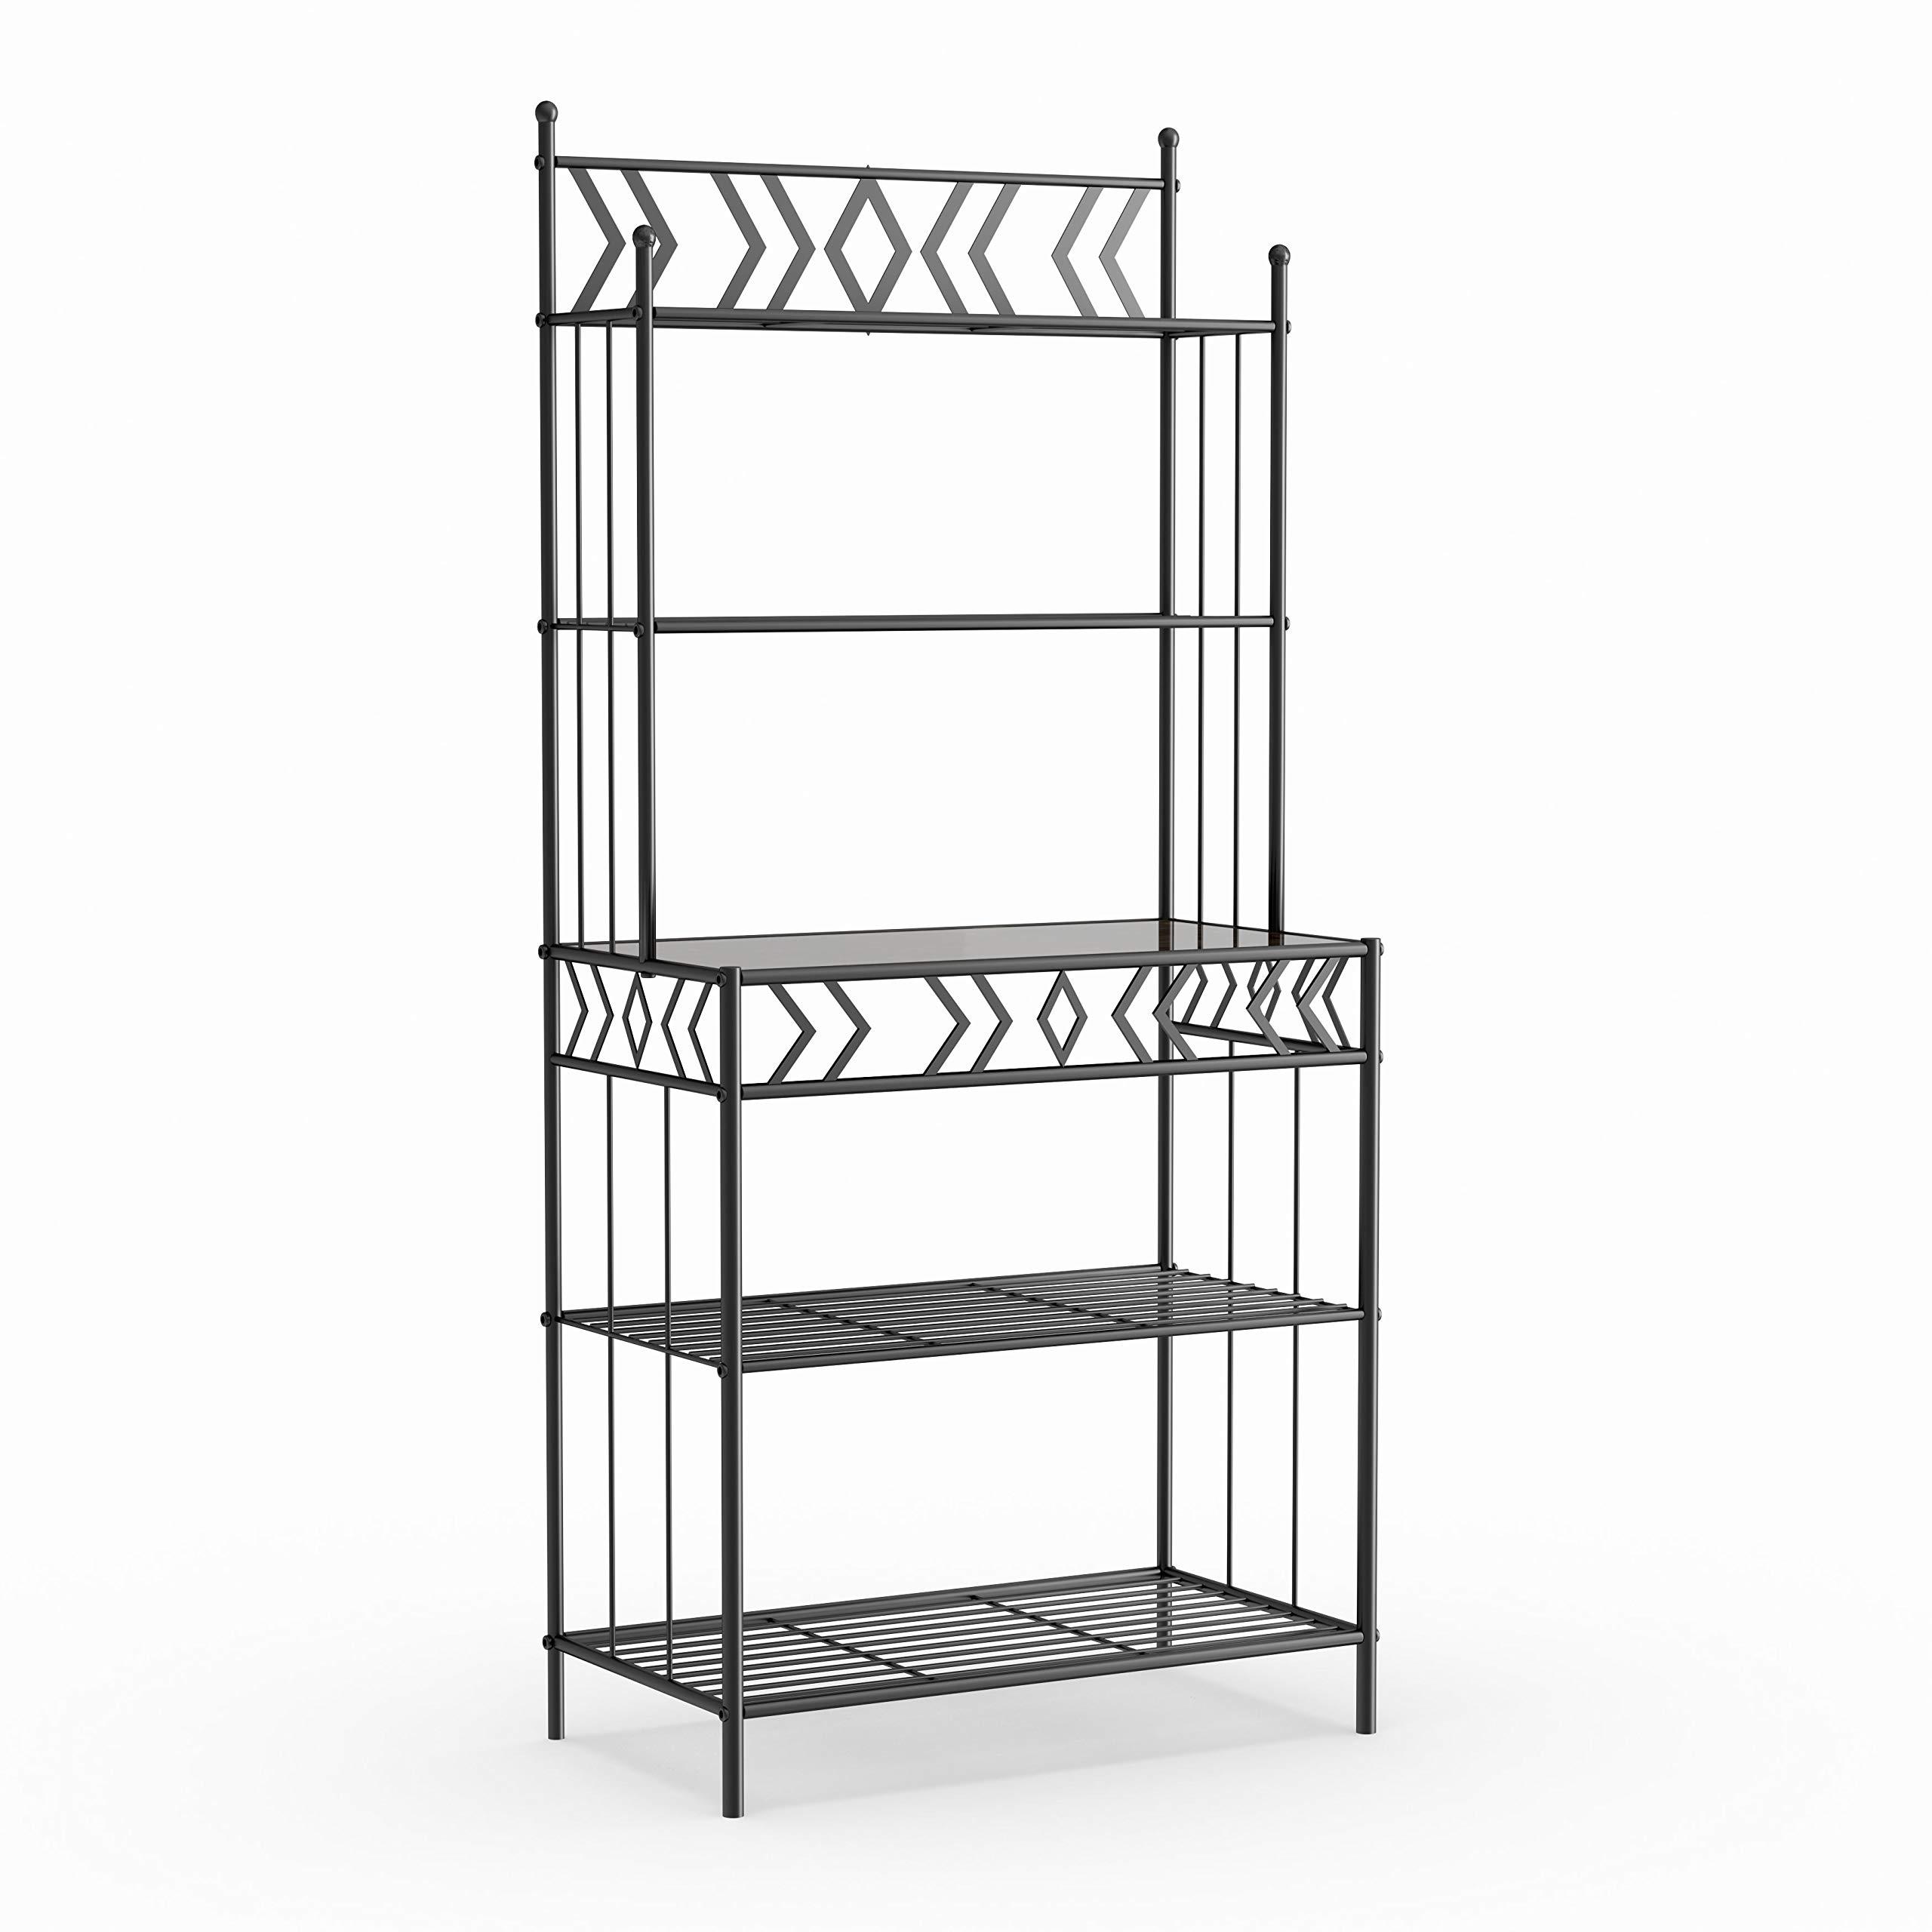 Porch & Den Black Metal Storage Bakers Rack by K & B Furniture (Image #2)